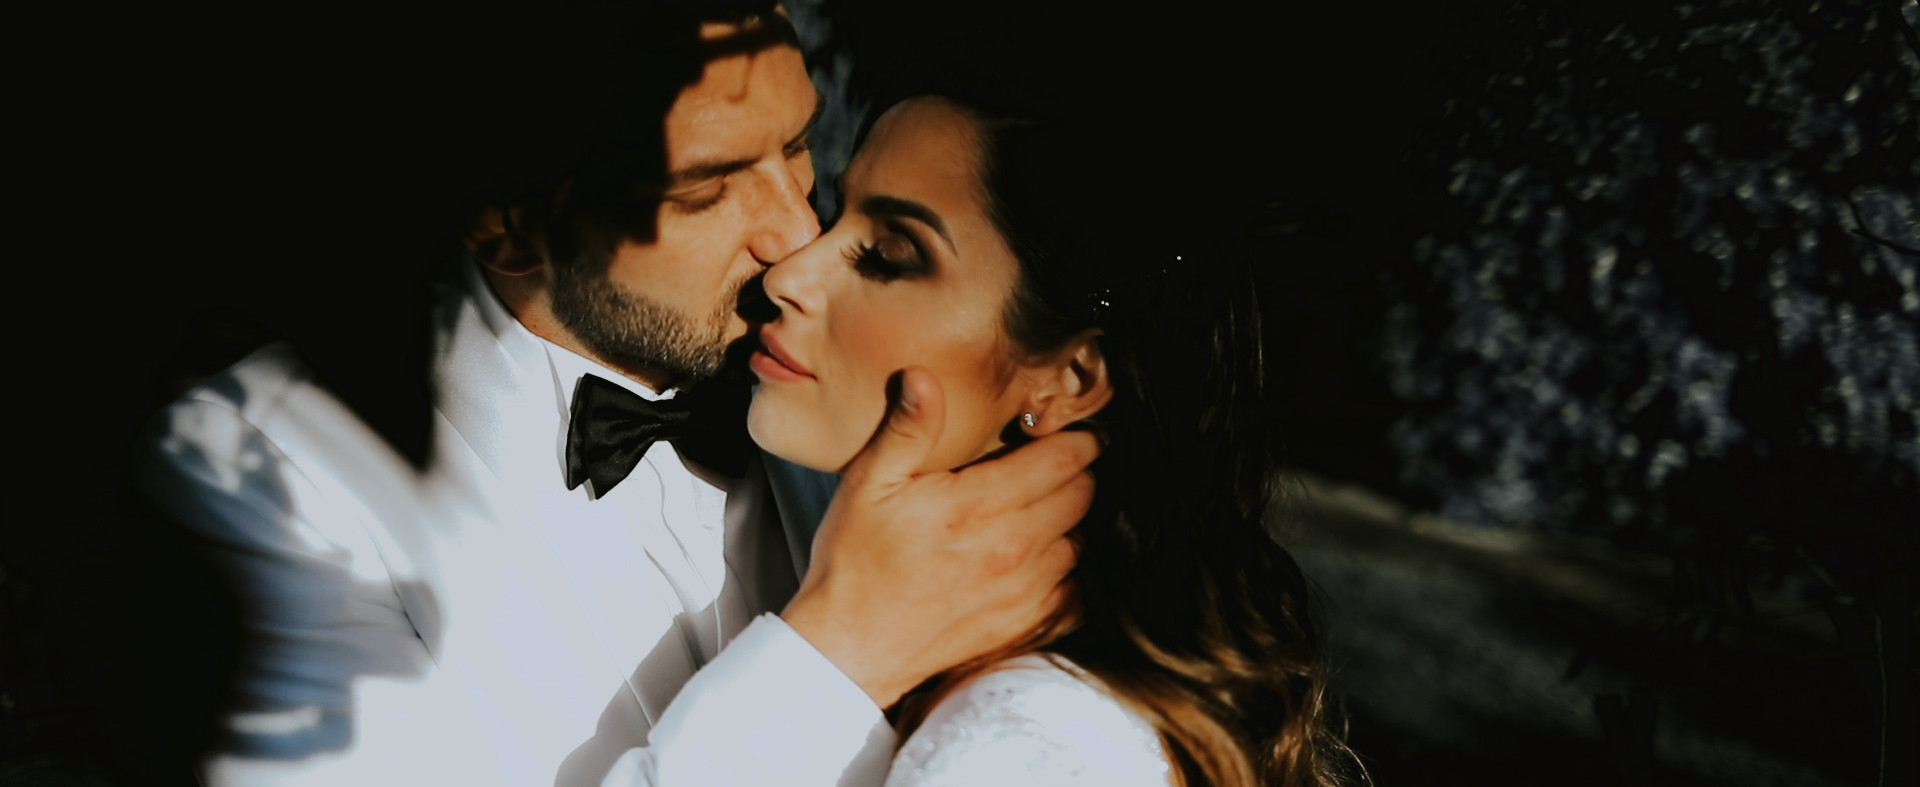 federico-cardone-alessia-macari-video-matrimonio-videografo-4 Matrimonio Alessia Macari e Oliver Kragl